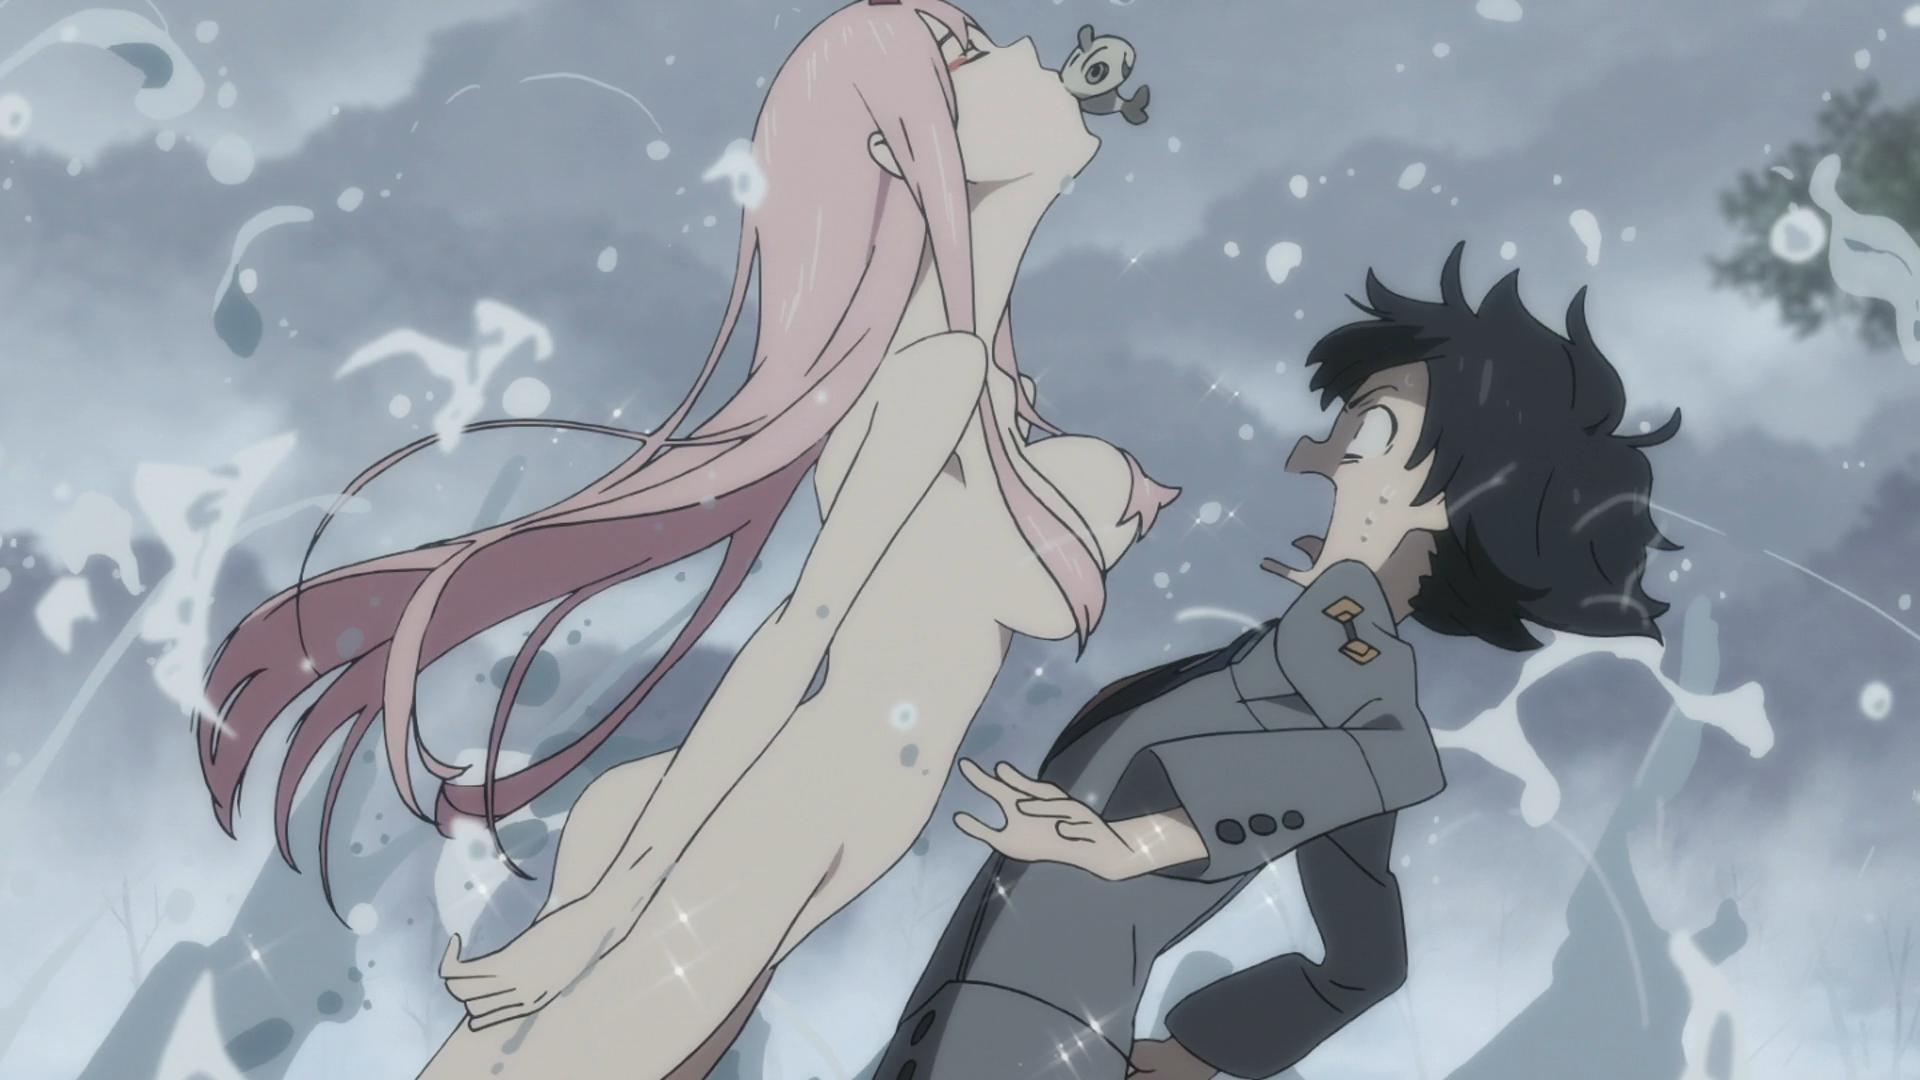 Anime Porn Parody animation revelation's animation blog » the winter 2018